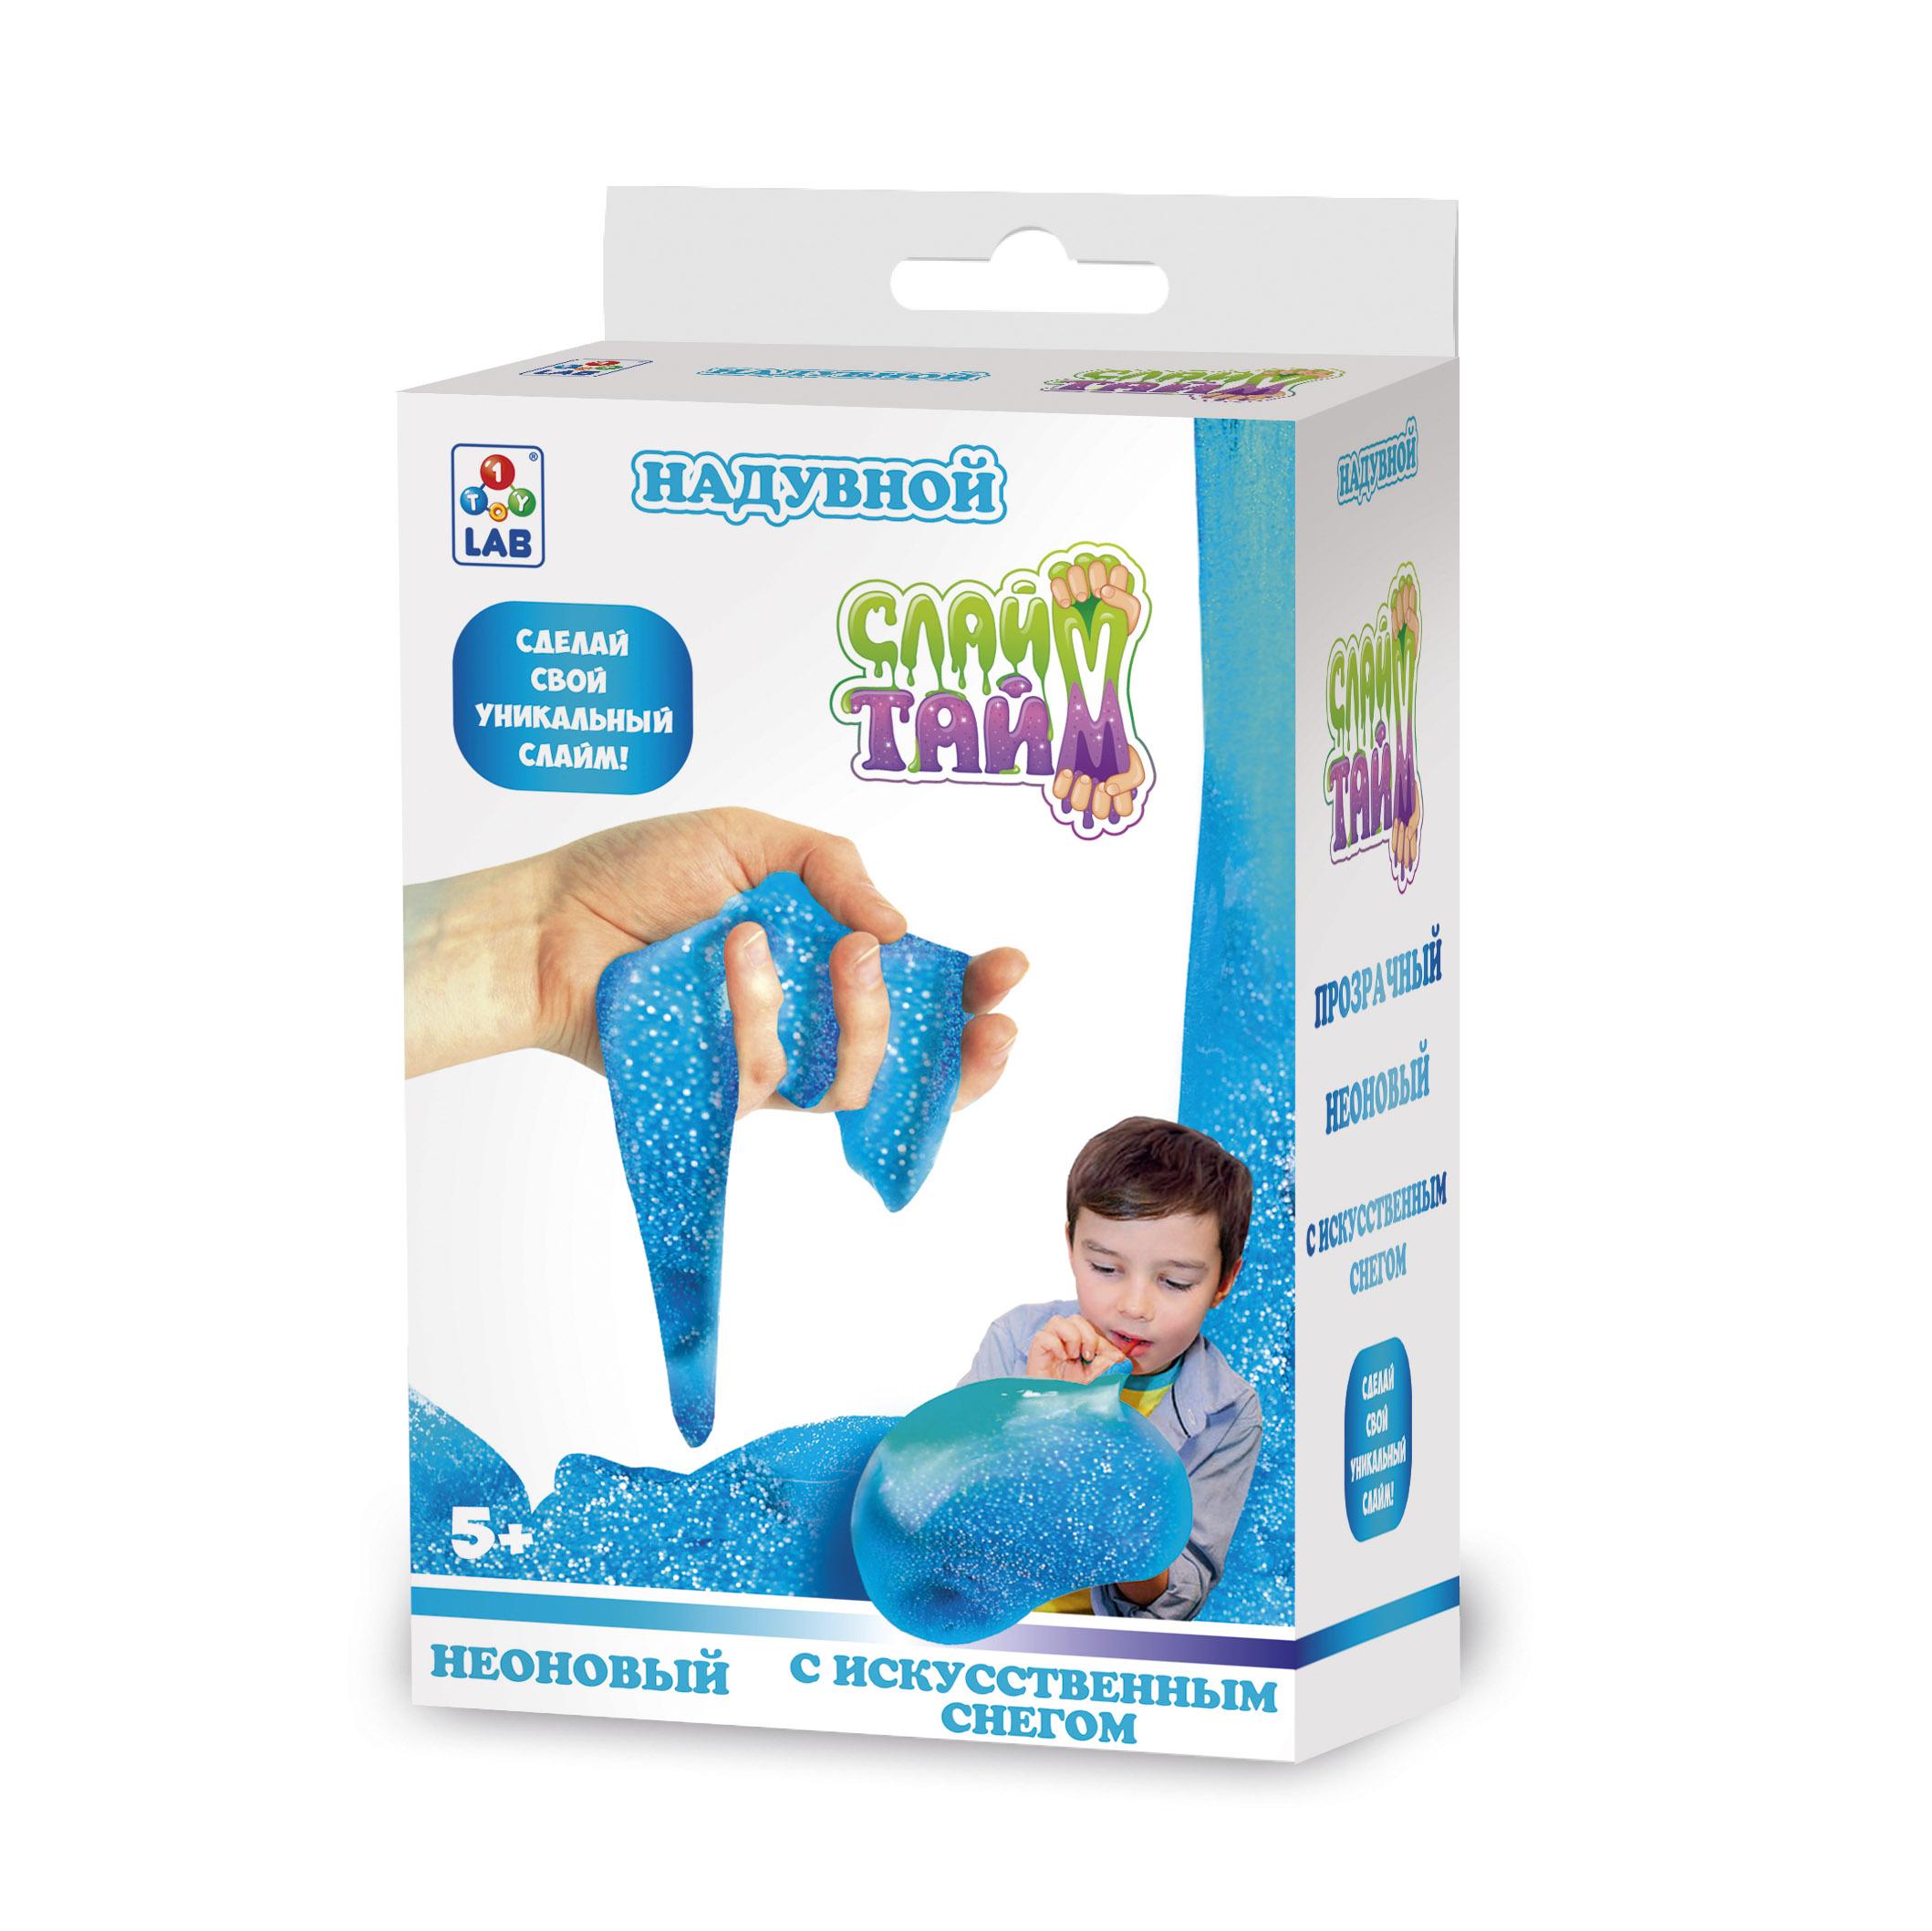 Набор 1Toy Слайм тайм. Сделай надувной слайм со снегом